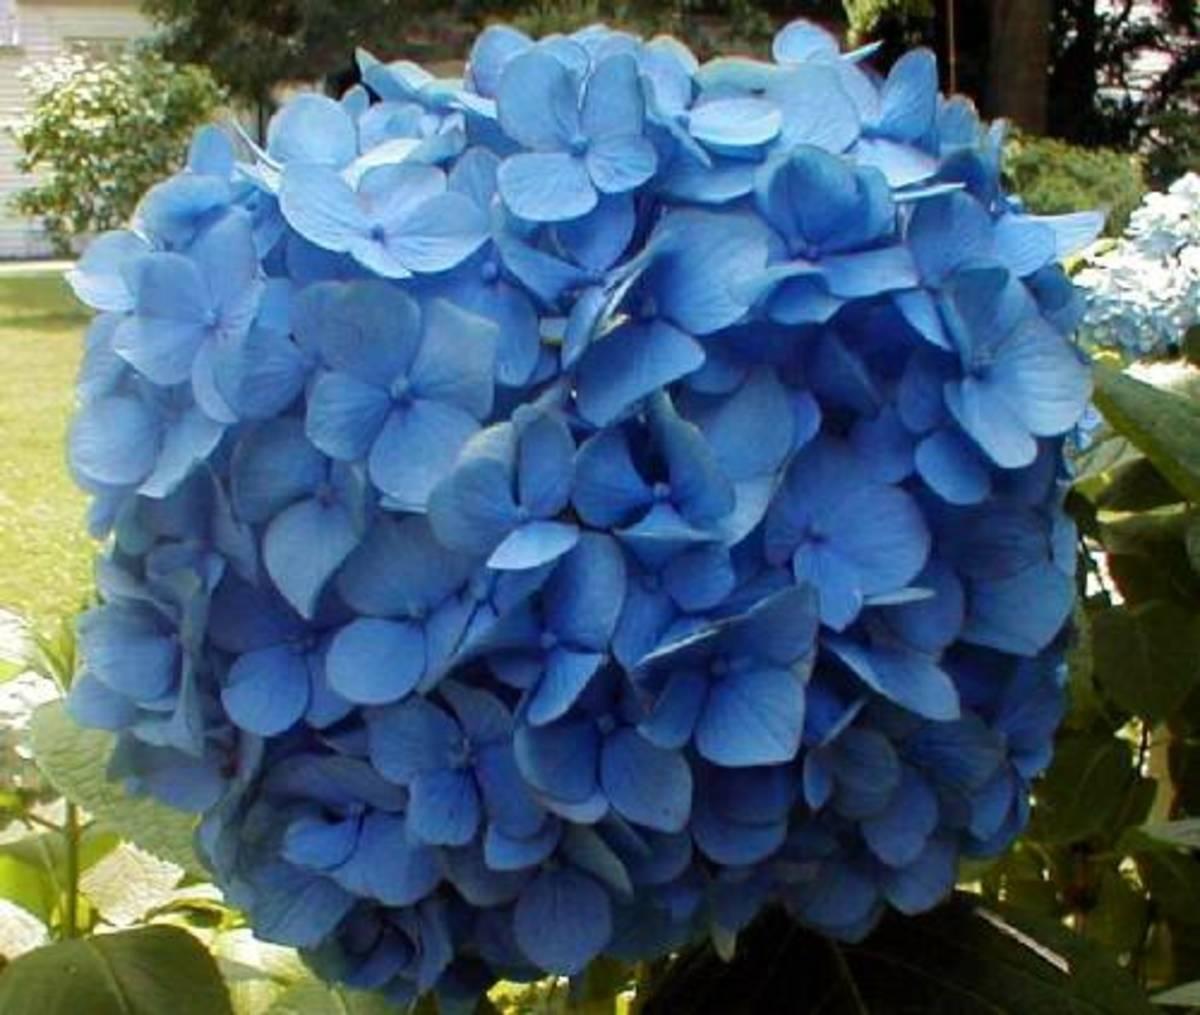 Blue hydrangea flower cluster.